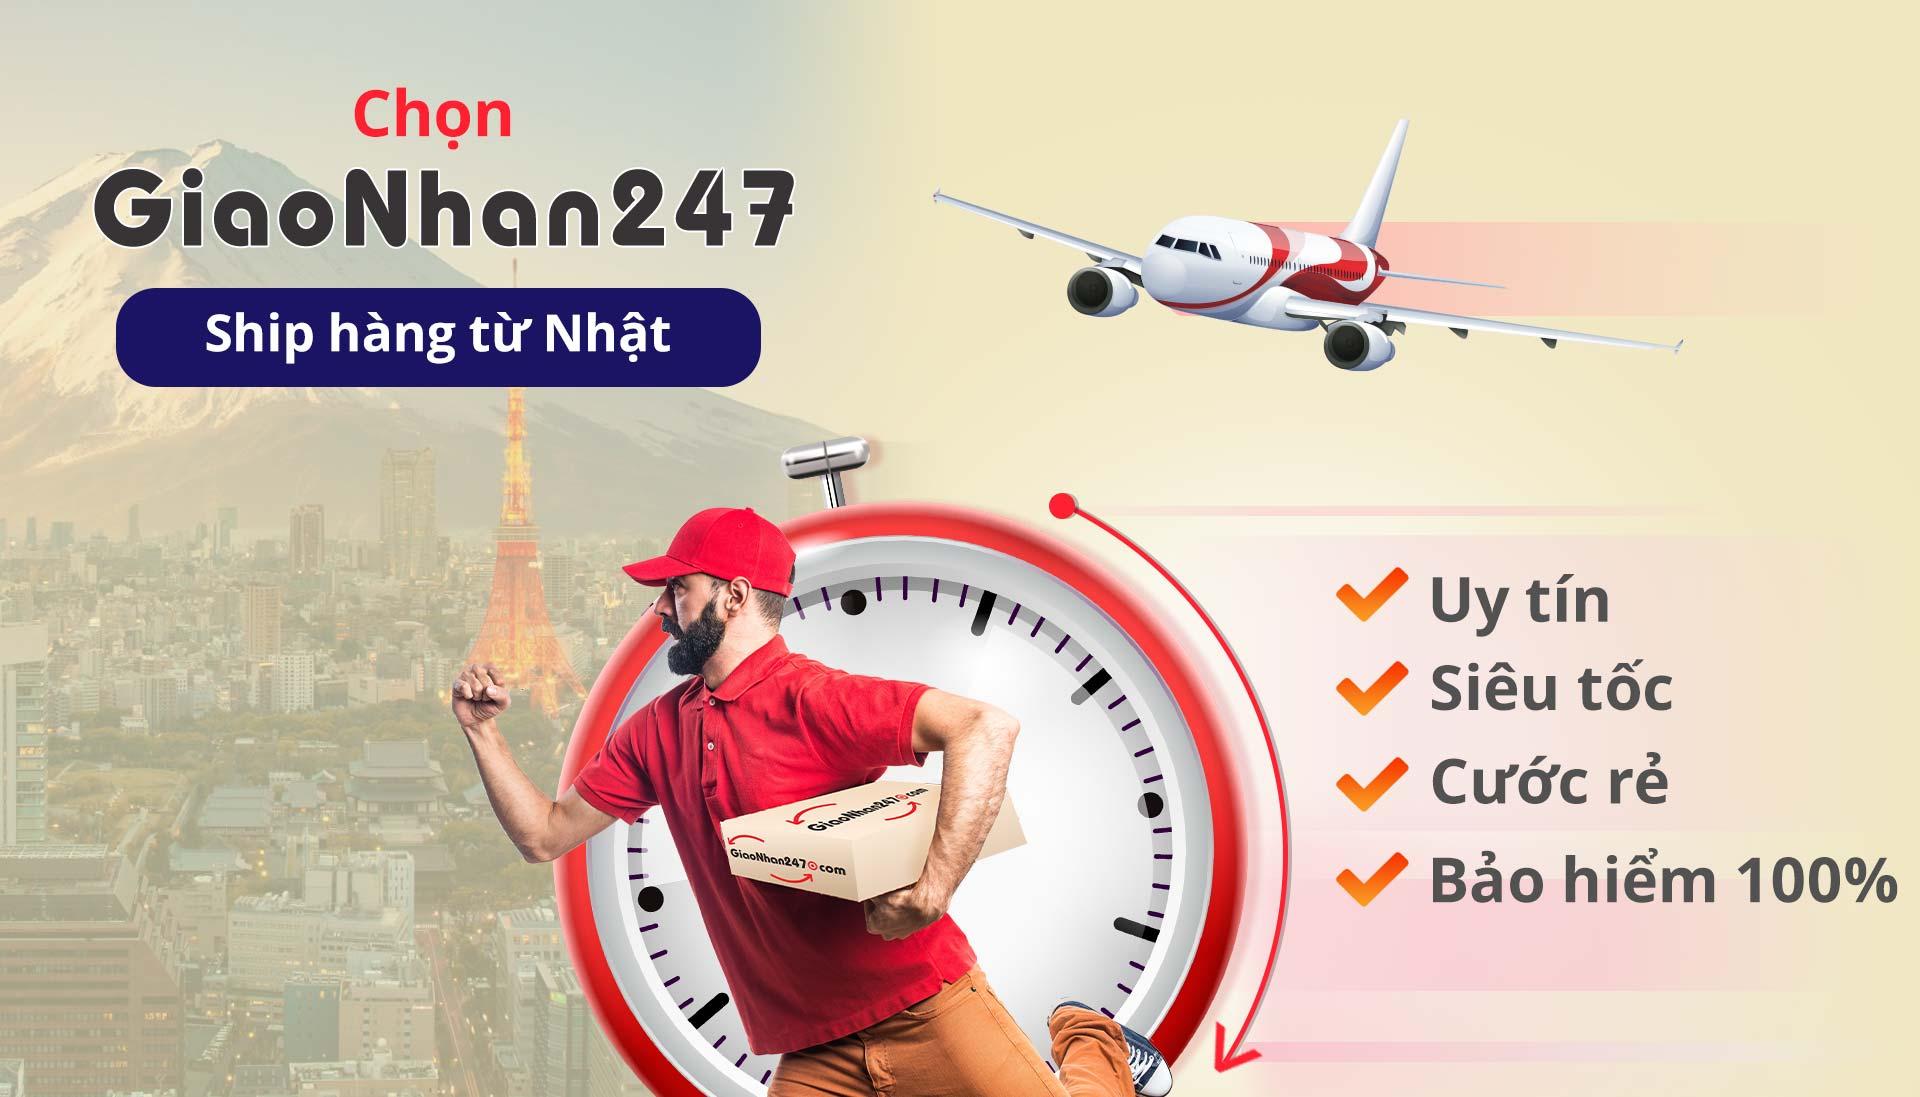 chon-giaonhan247-ship-hang-tu-nhat